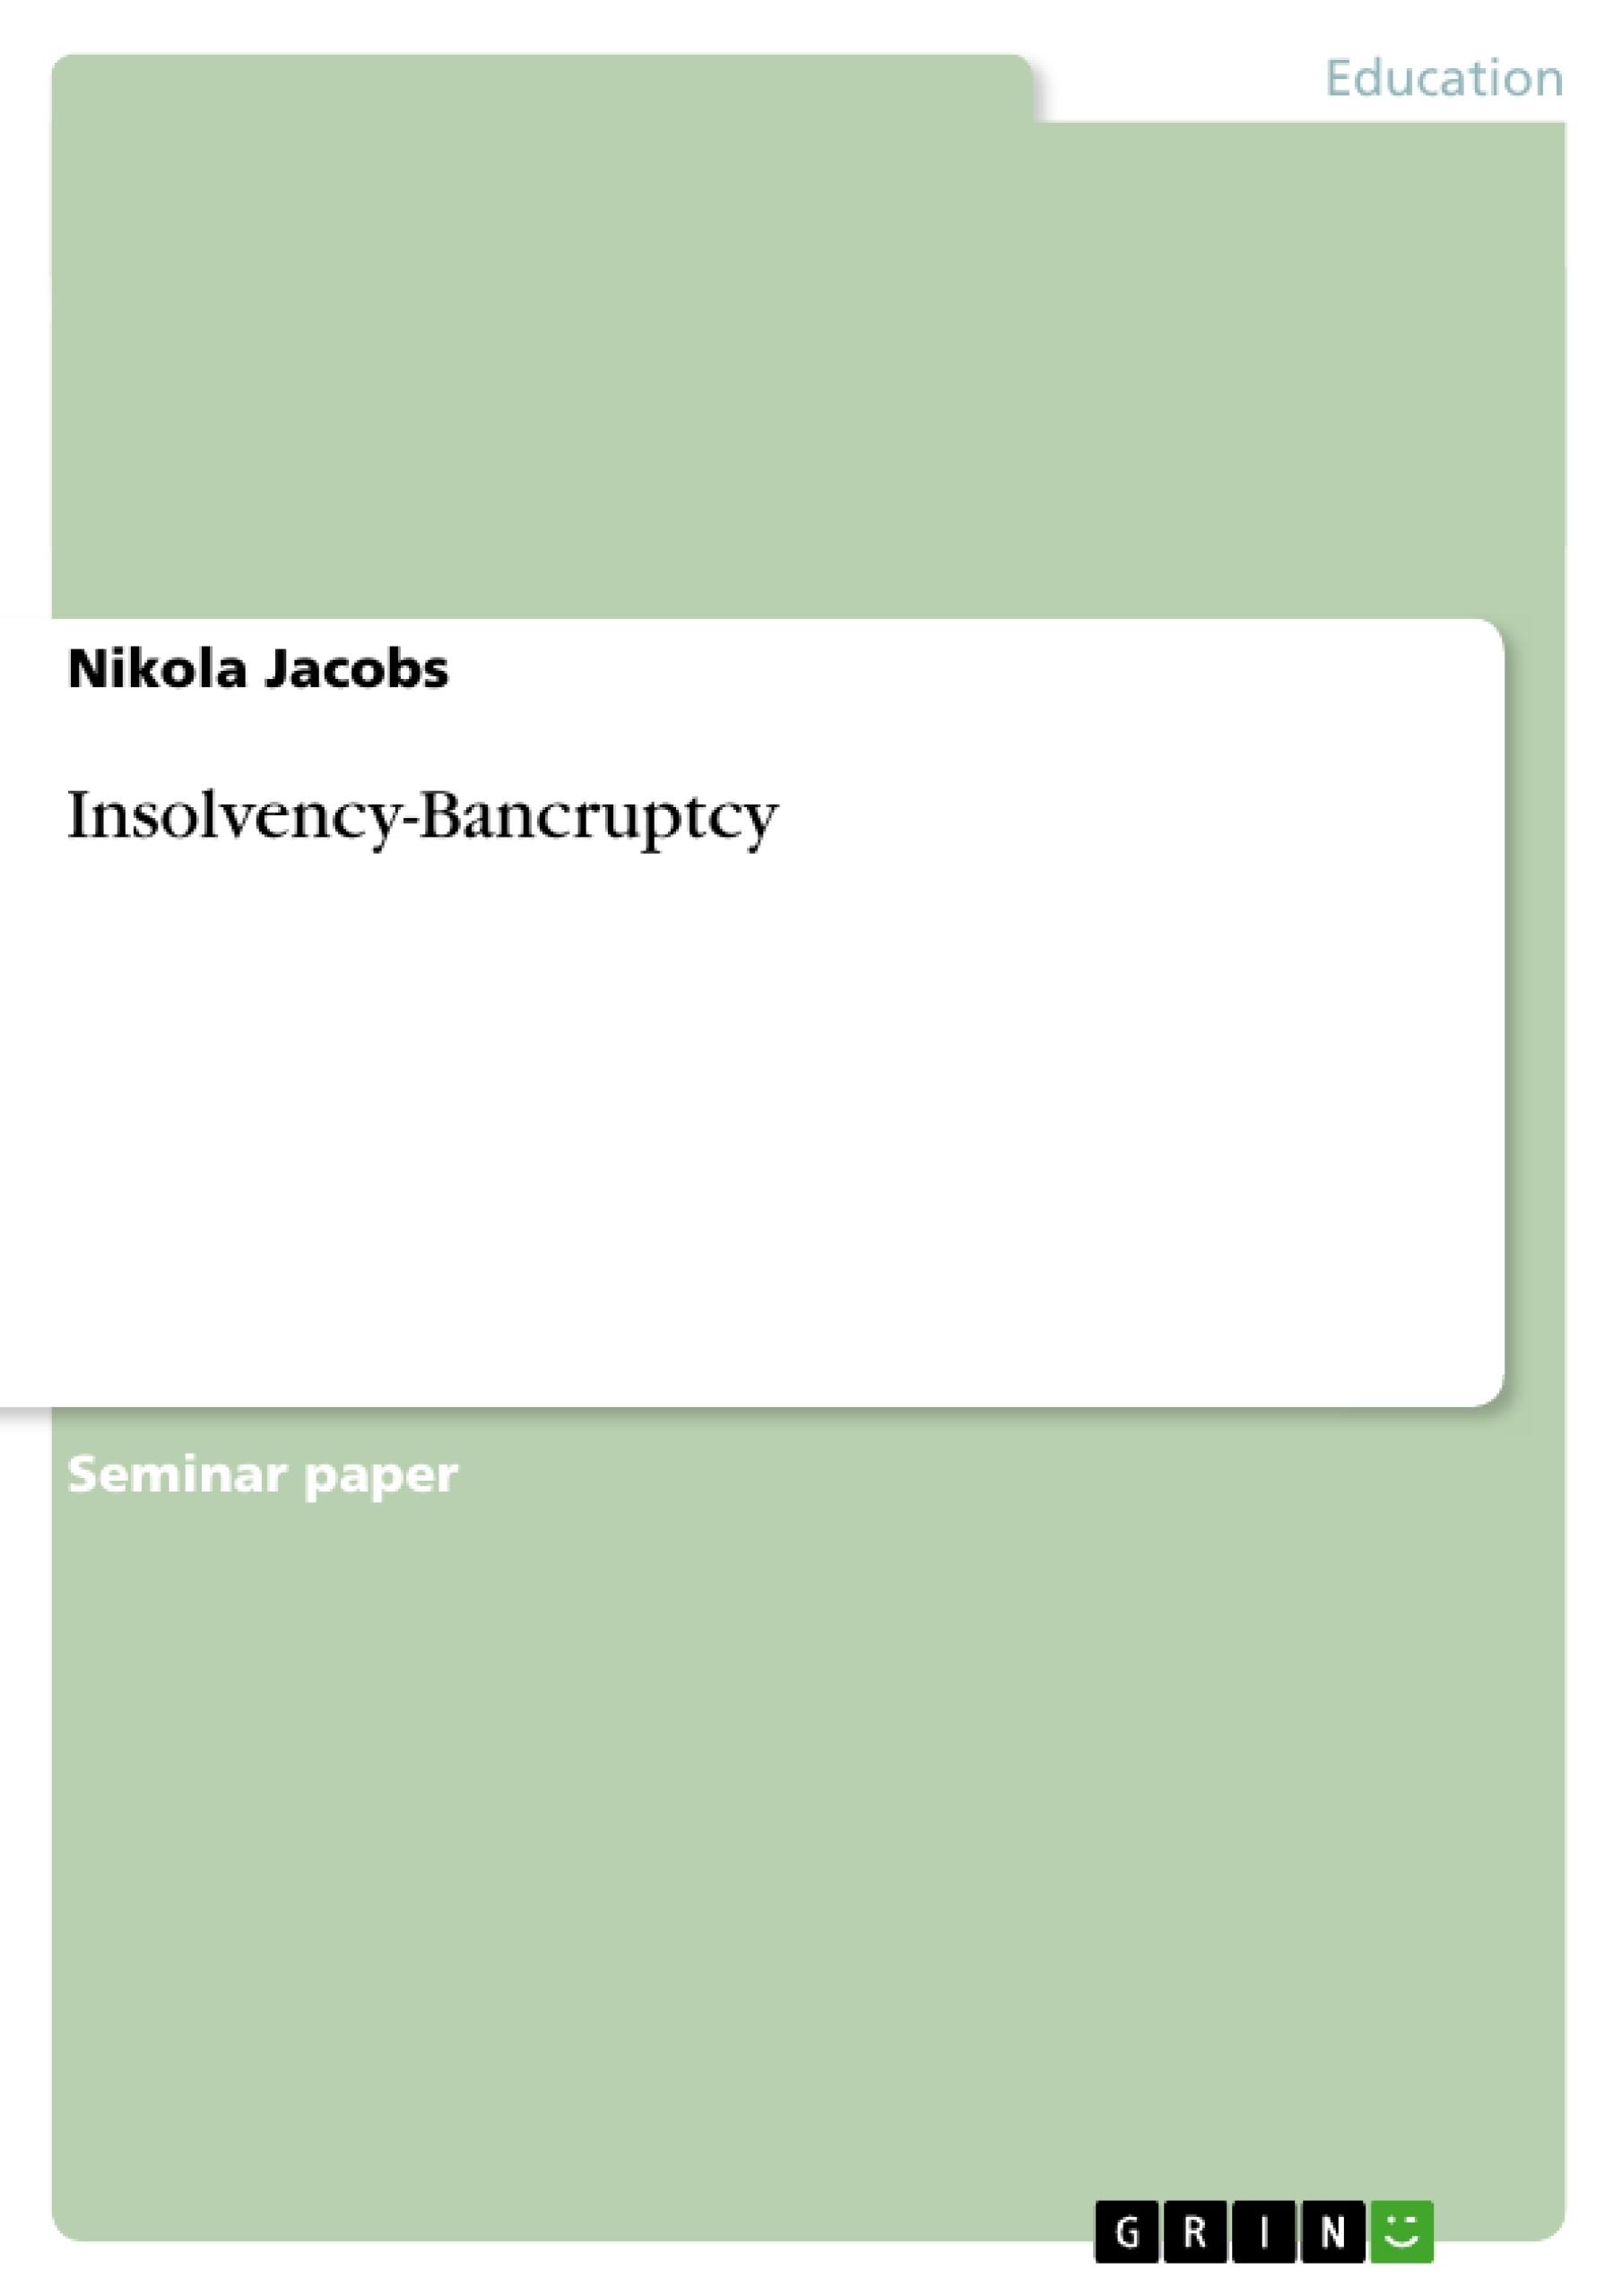 Title: Insolvency-Bancruptcy